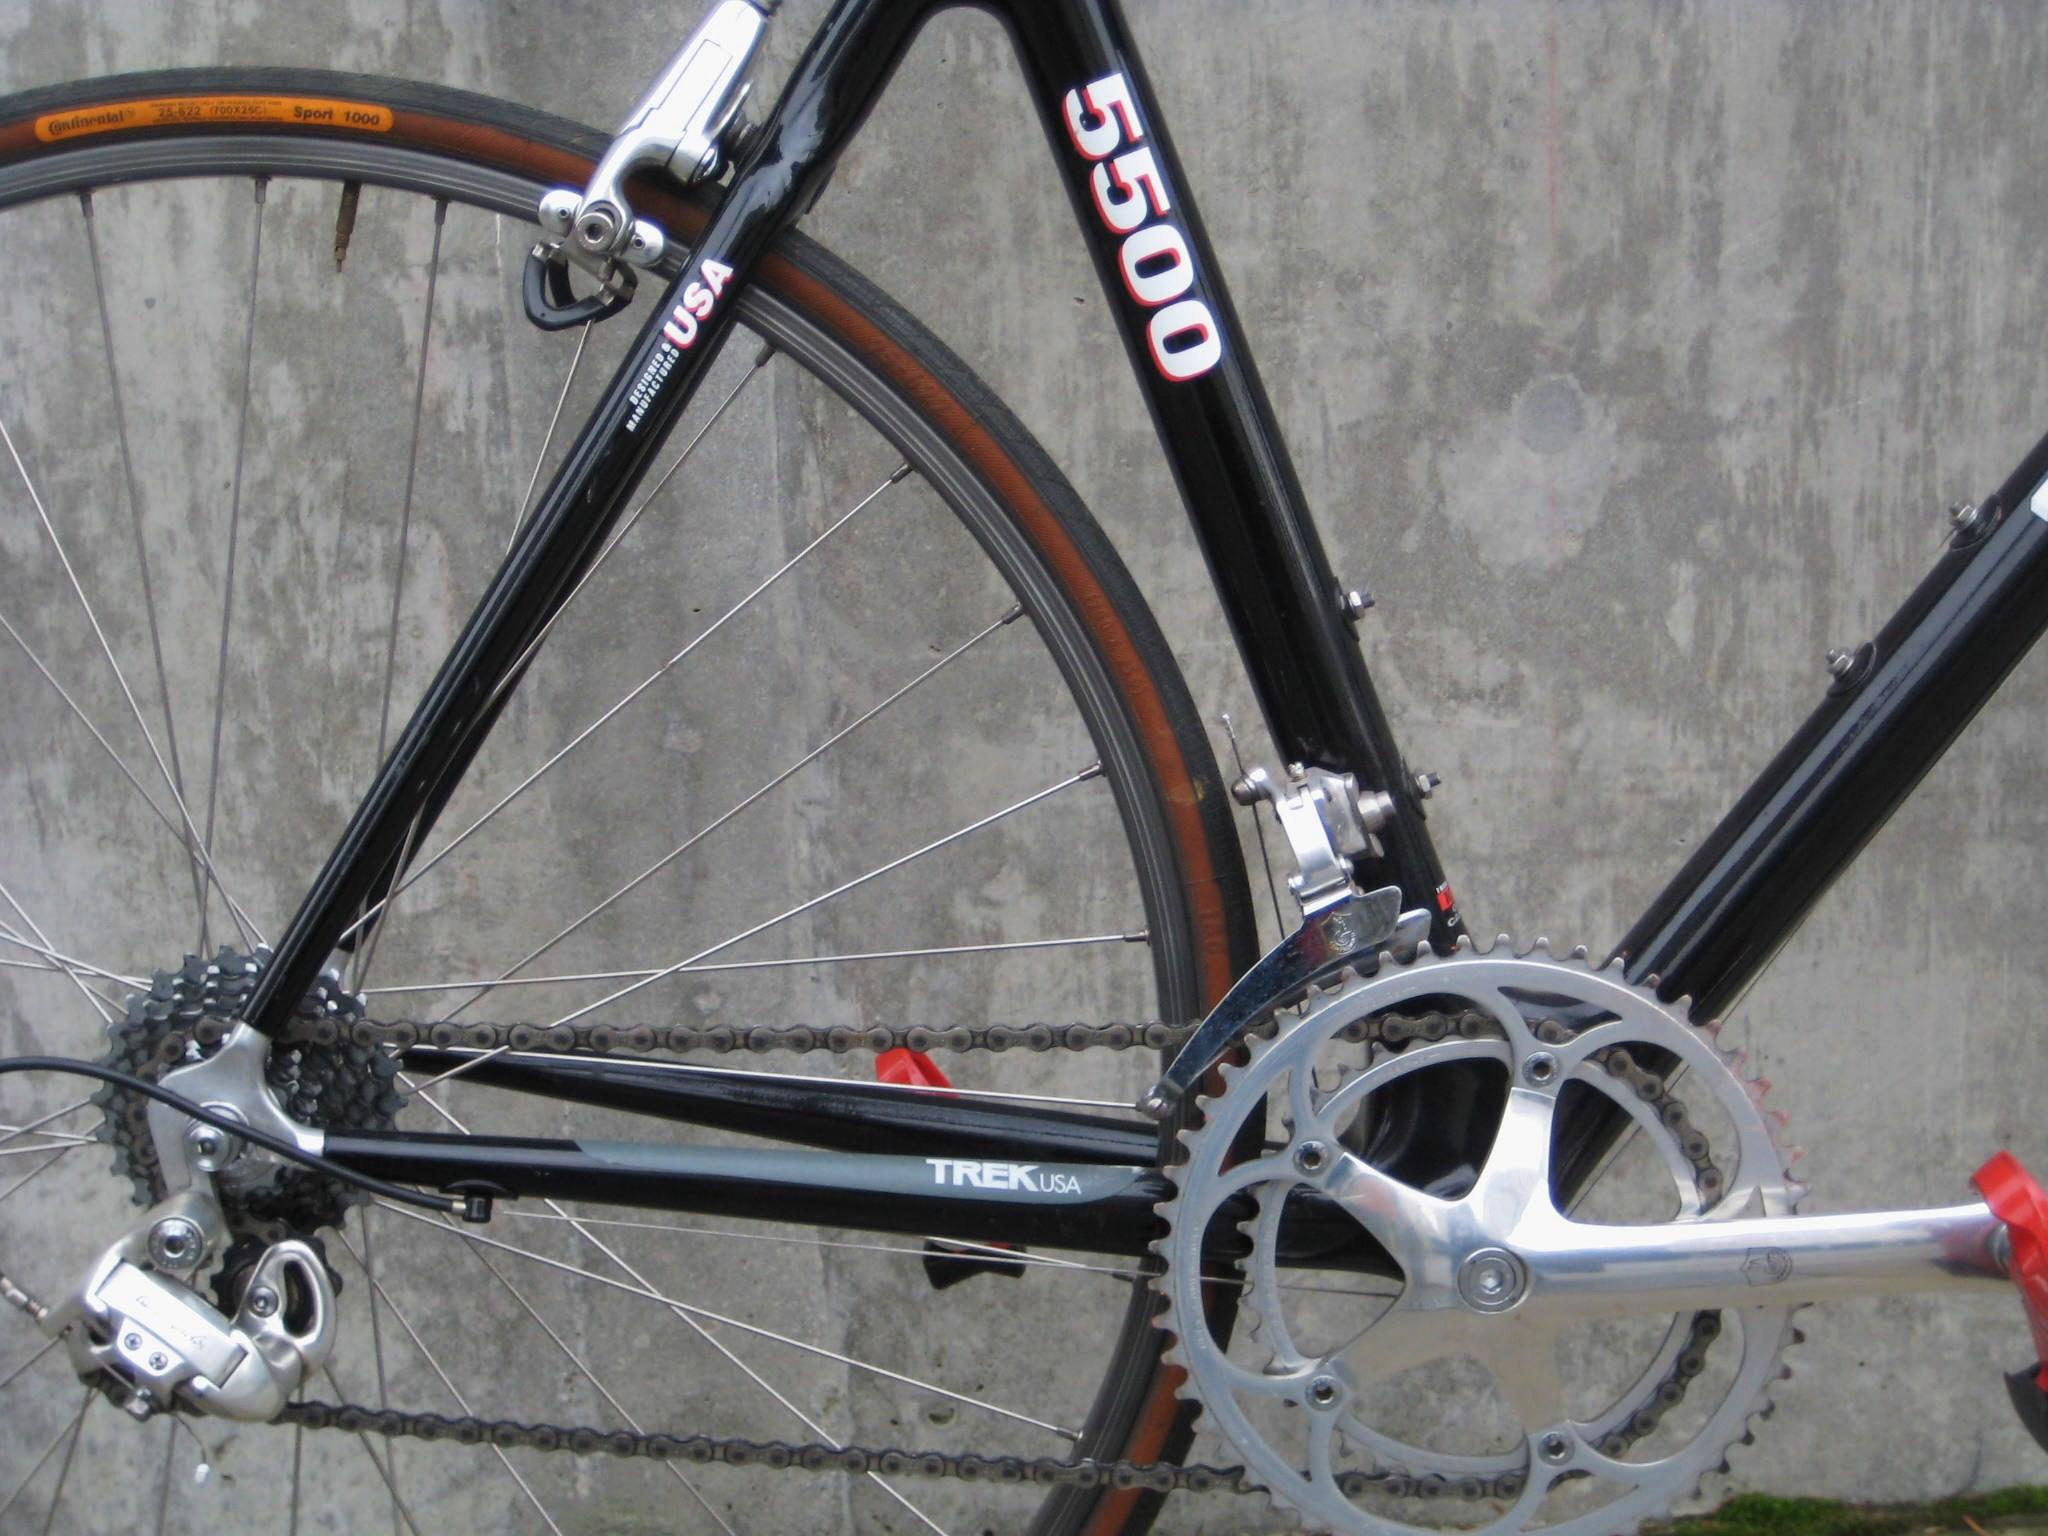 1992 Trek 5500 OCLV Carbon fiber road bike   Classic Cycle ...